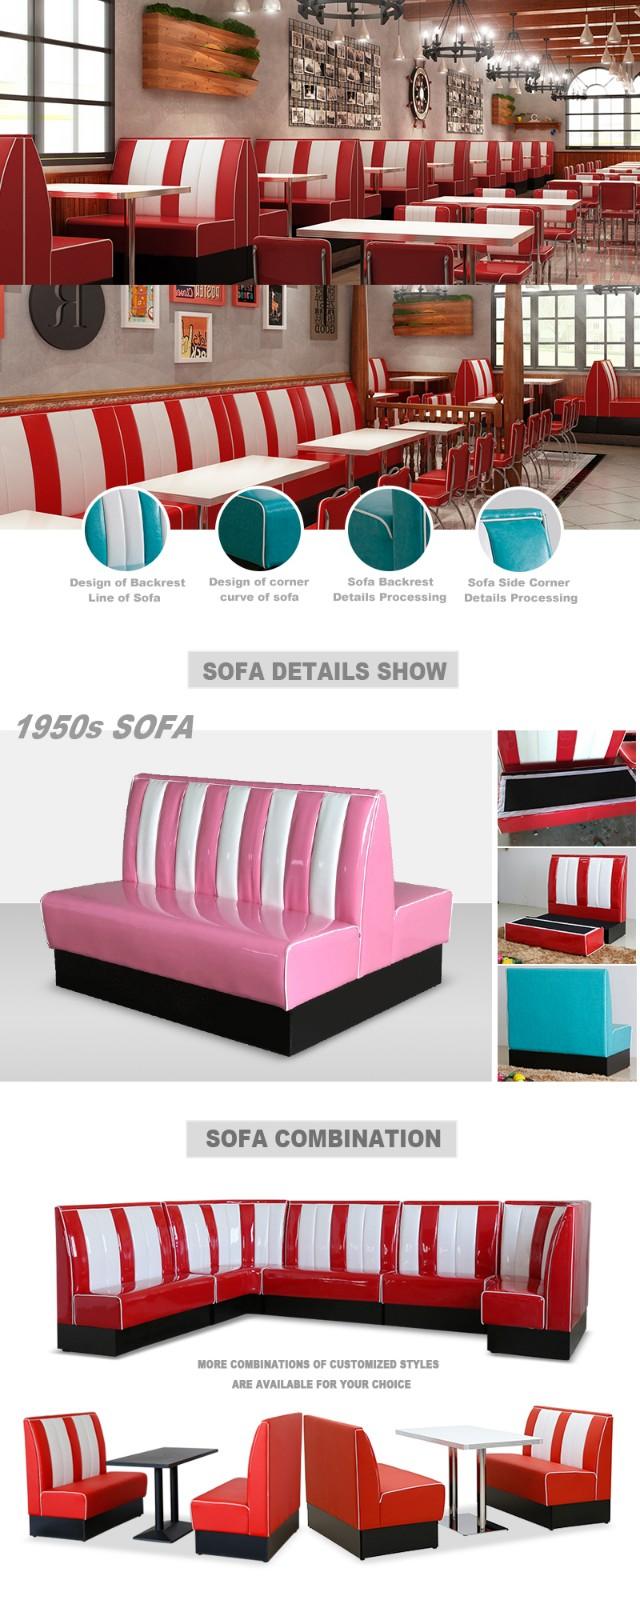 Uptop Furnishings-Oem Restaurant Furniture Solution Price List | Uptop Furnishings-1